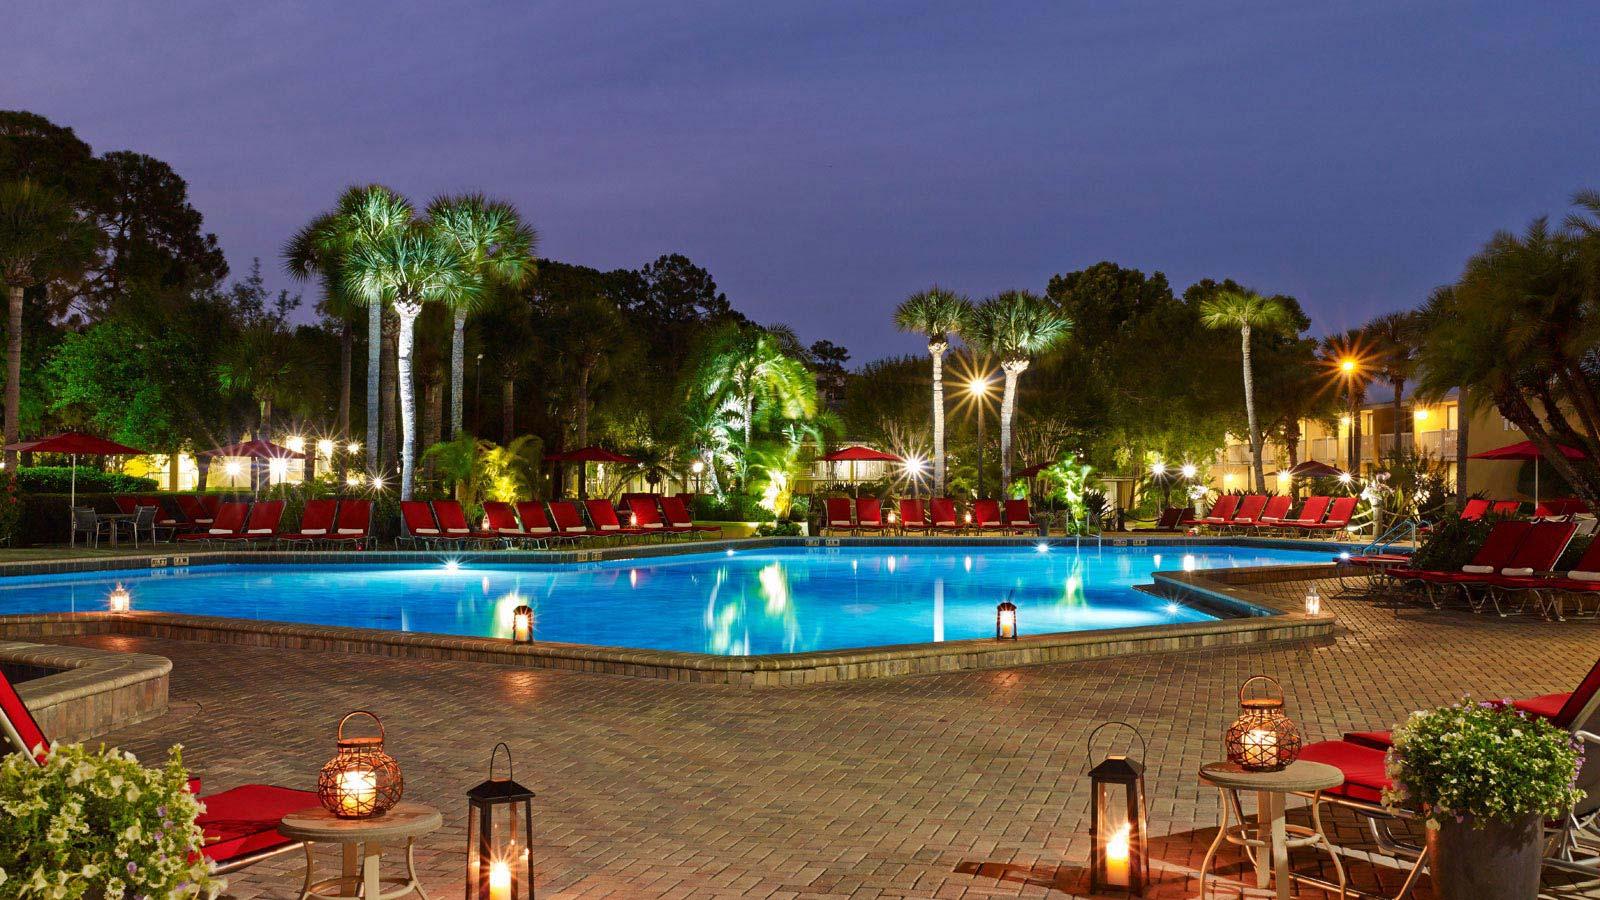 wyndham-orlando-resort-international-drive-top1.jpg